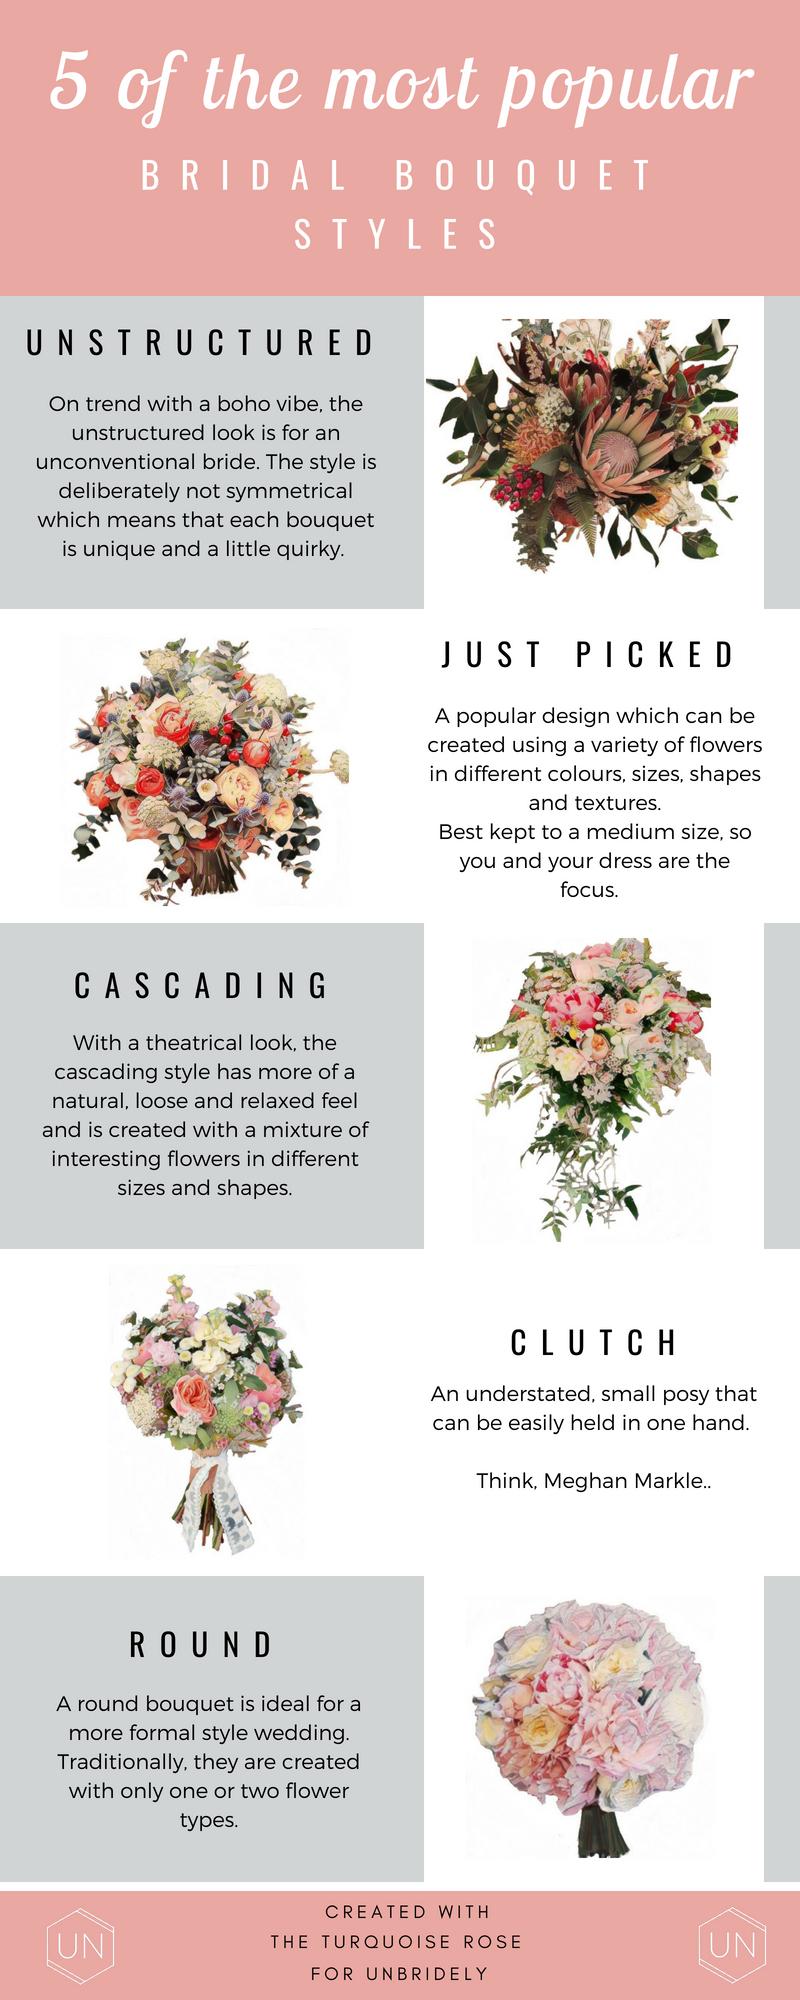 5 popular wedding bouquet styles.jpg